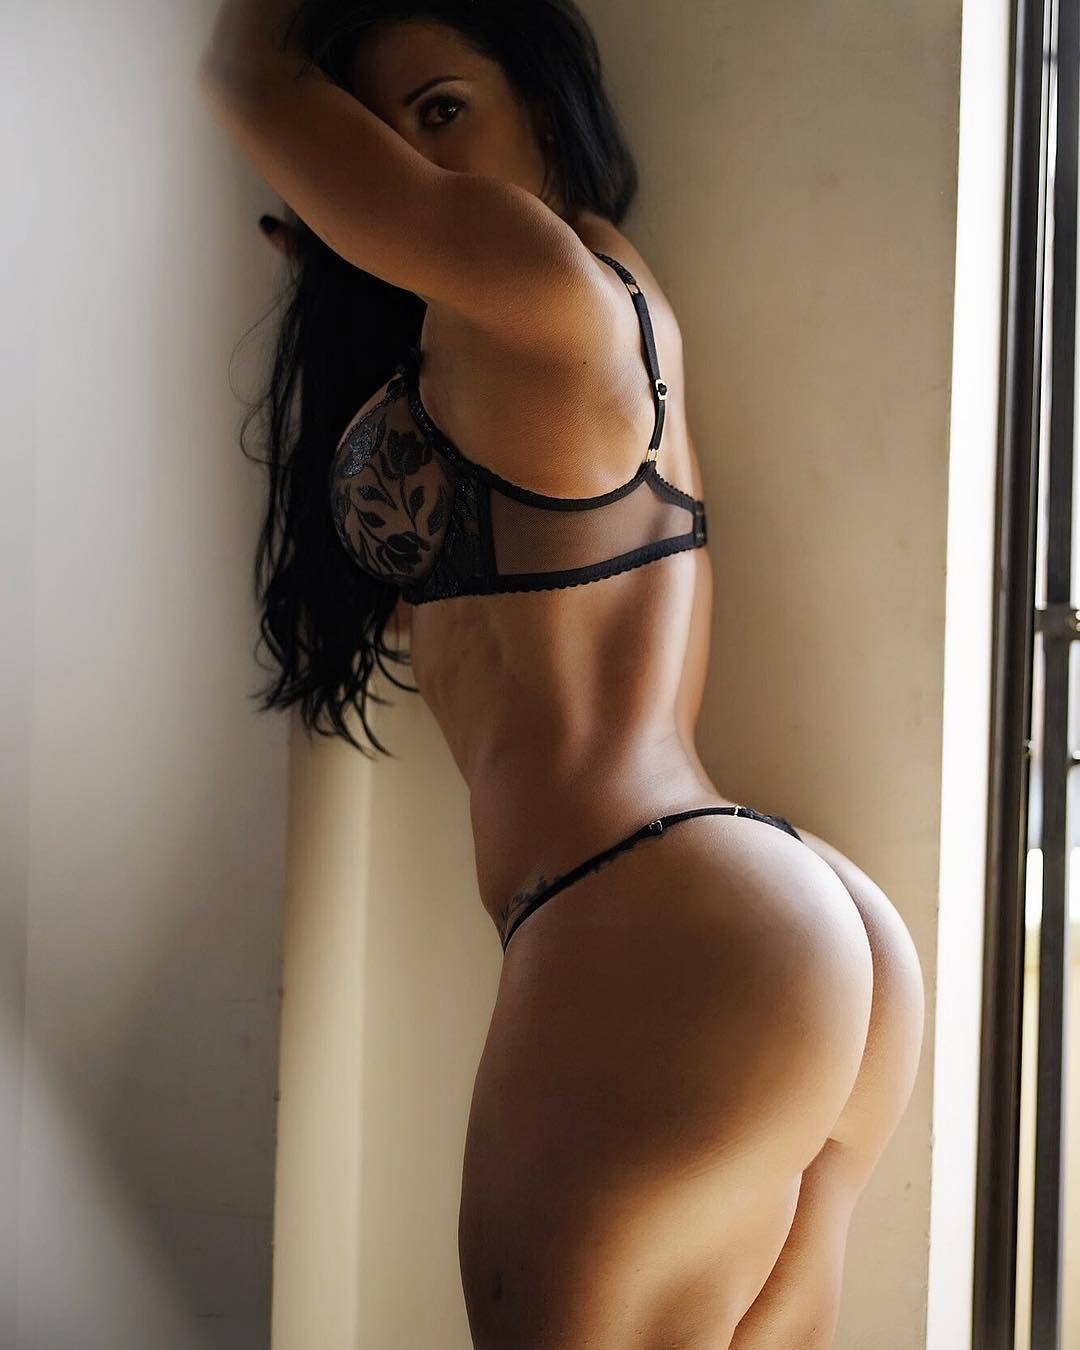 Ana Cozar Nude download sex pics ana cozar espana927 | nude picture hd